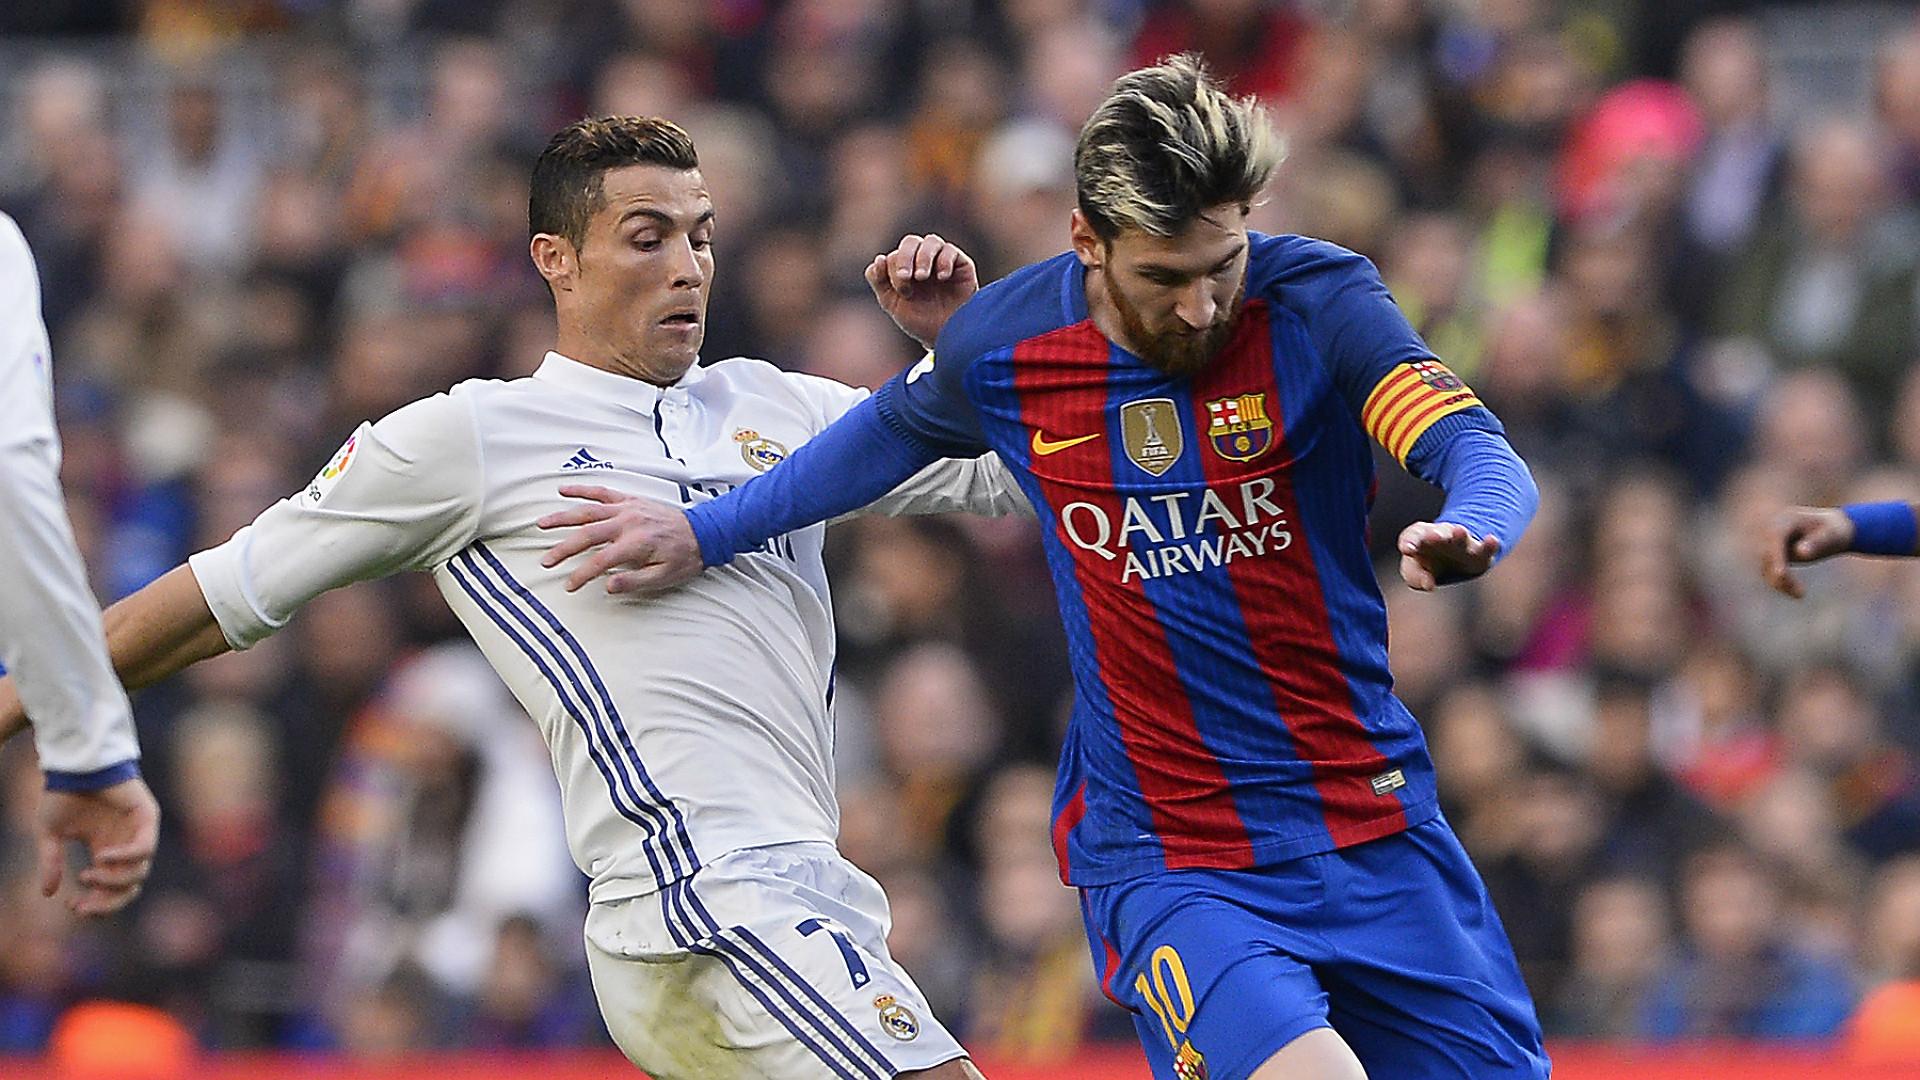 Ronaldo And Messi Wallpaper (75+ Images